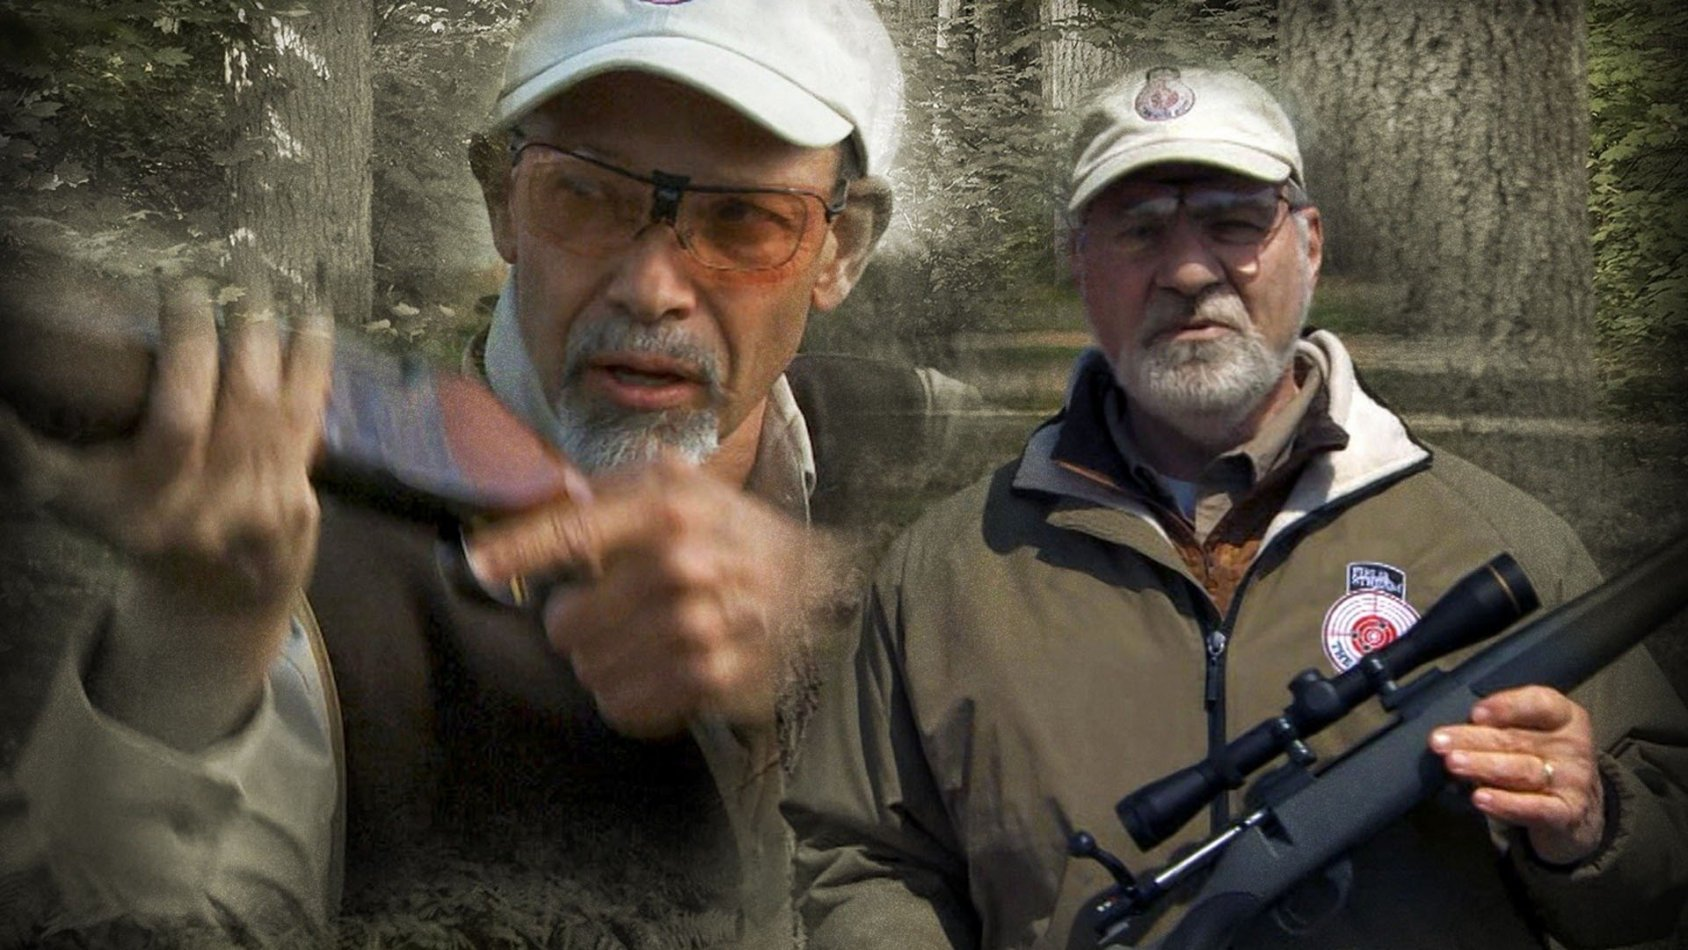 Field & Streams the Gun Nuts